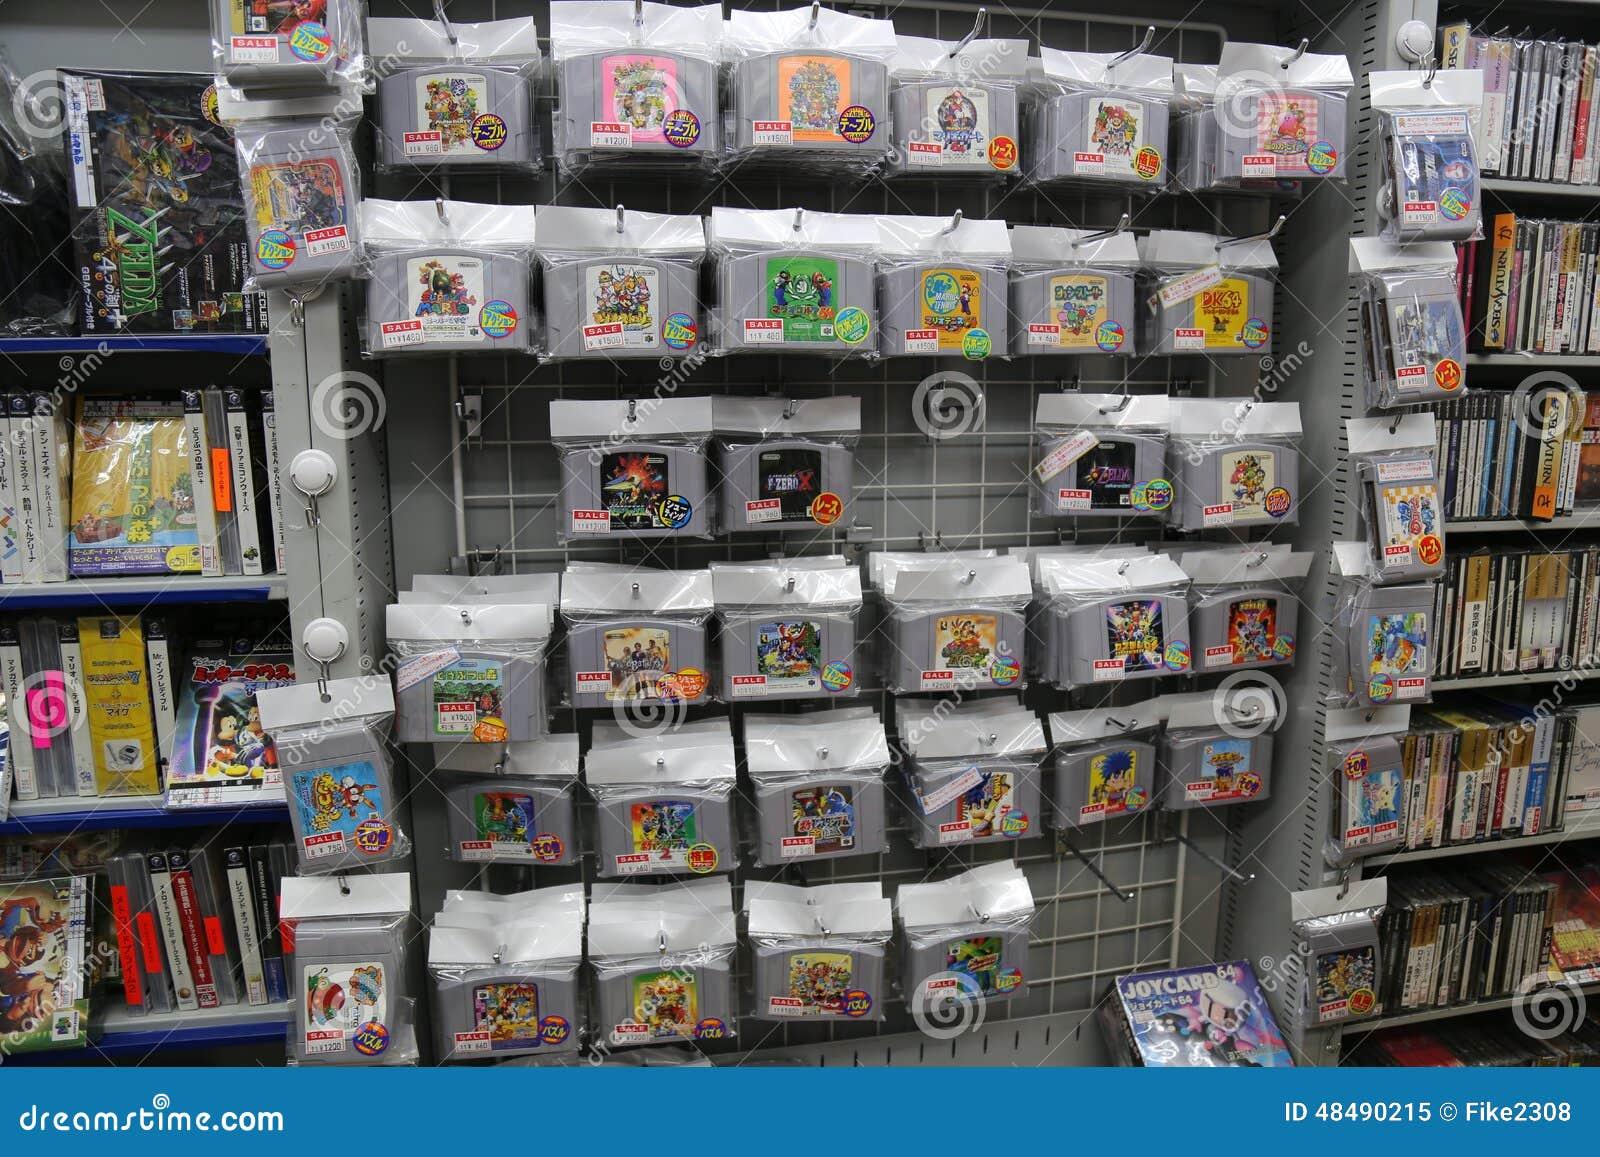 Japanese Nintendo 64 Games editorial image  Image of